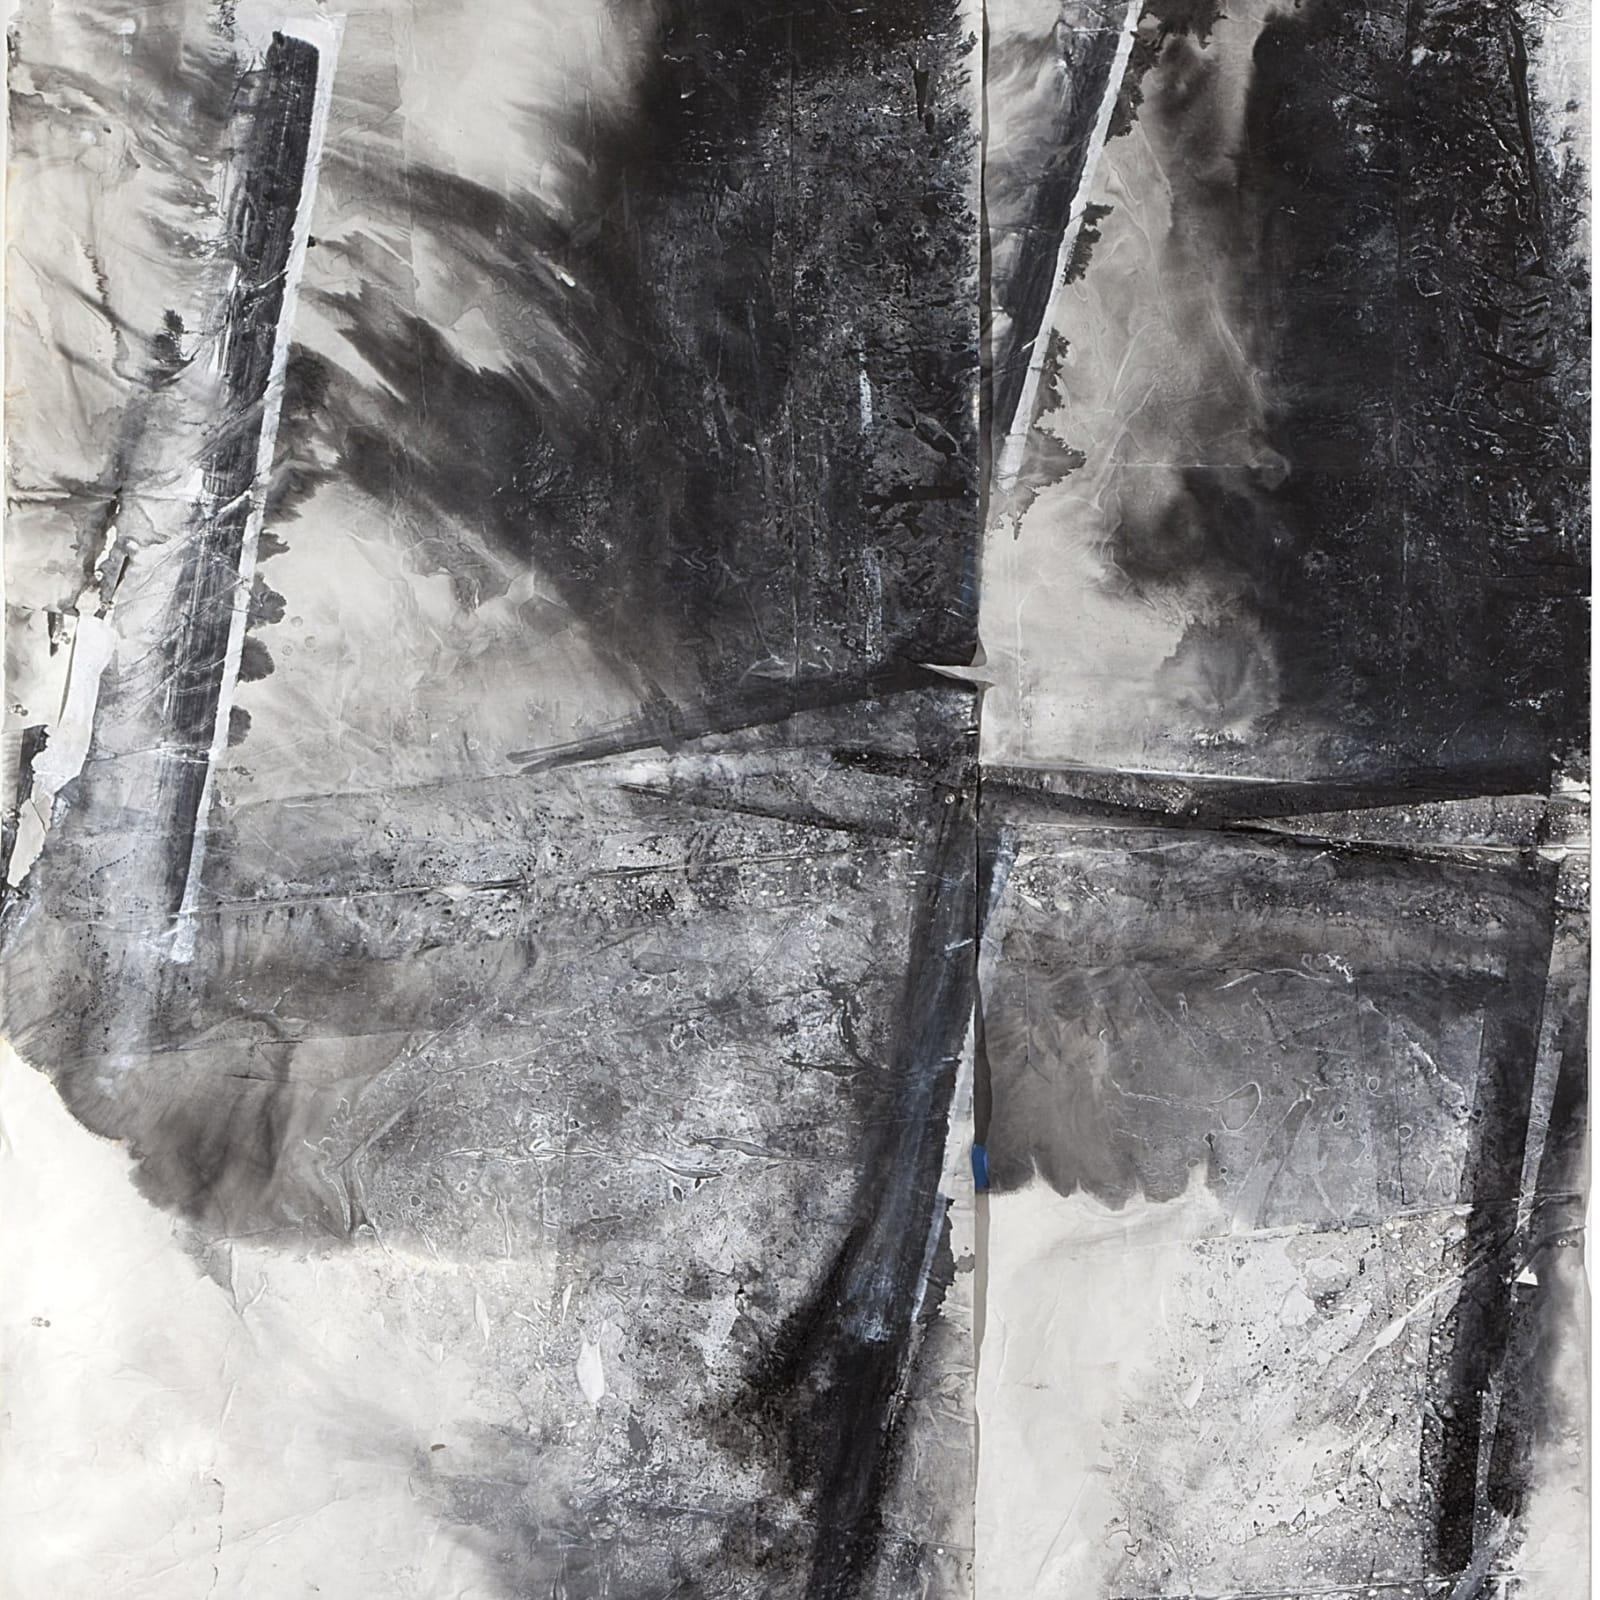 Zheng Chongbin 郑重宾, Four Cuts into the Space 空间中的四划, 2015